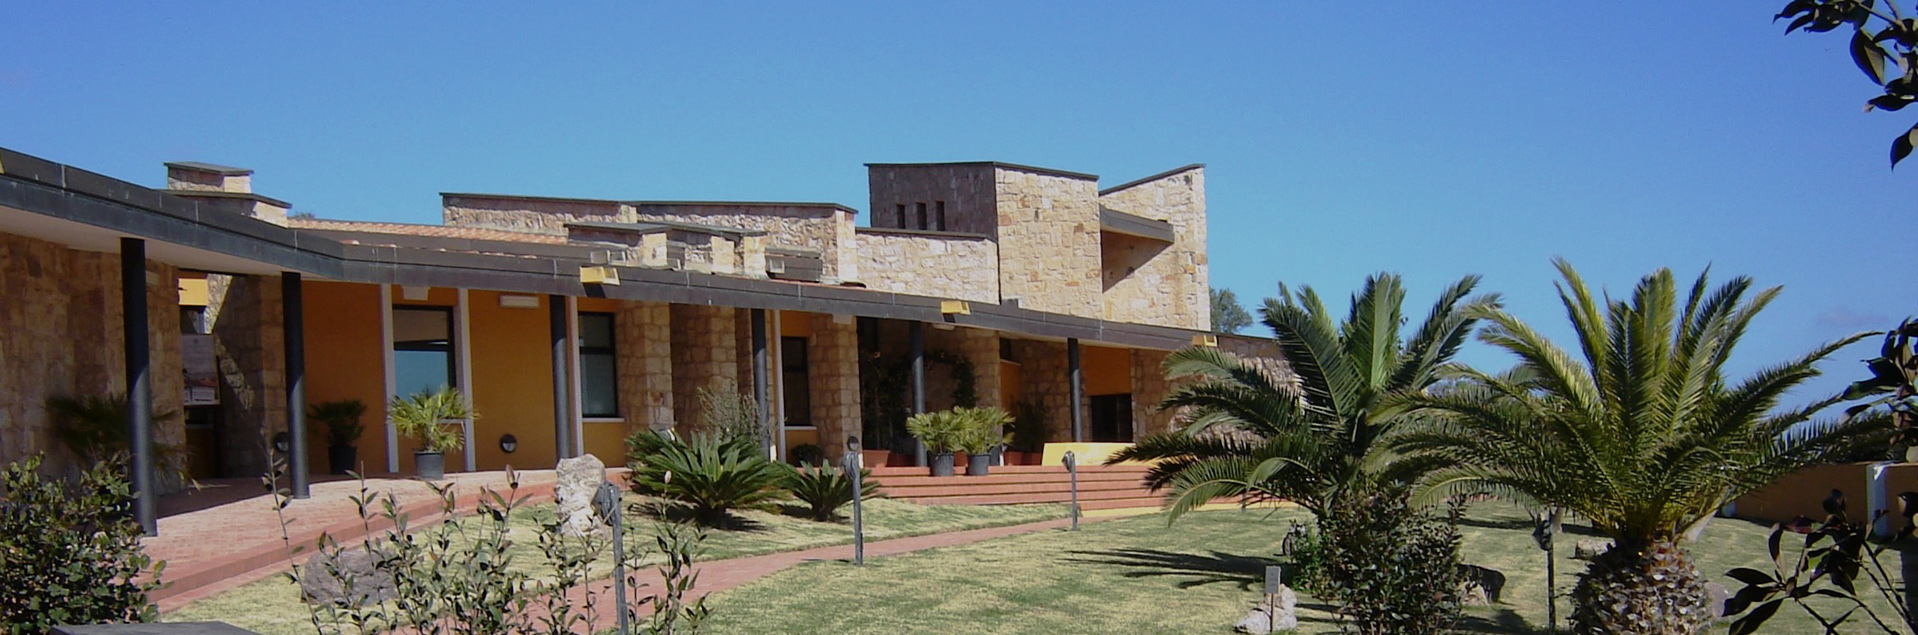 Museo Archeologico Ferruccio Barreca Sant'Antioco